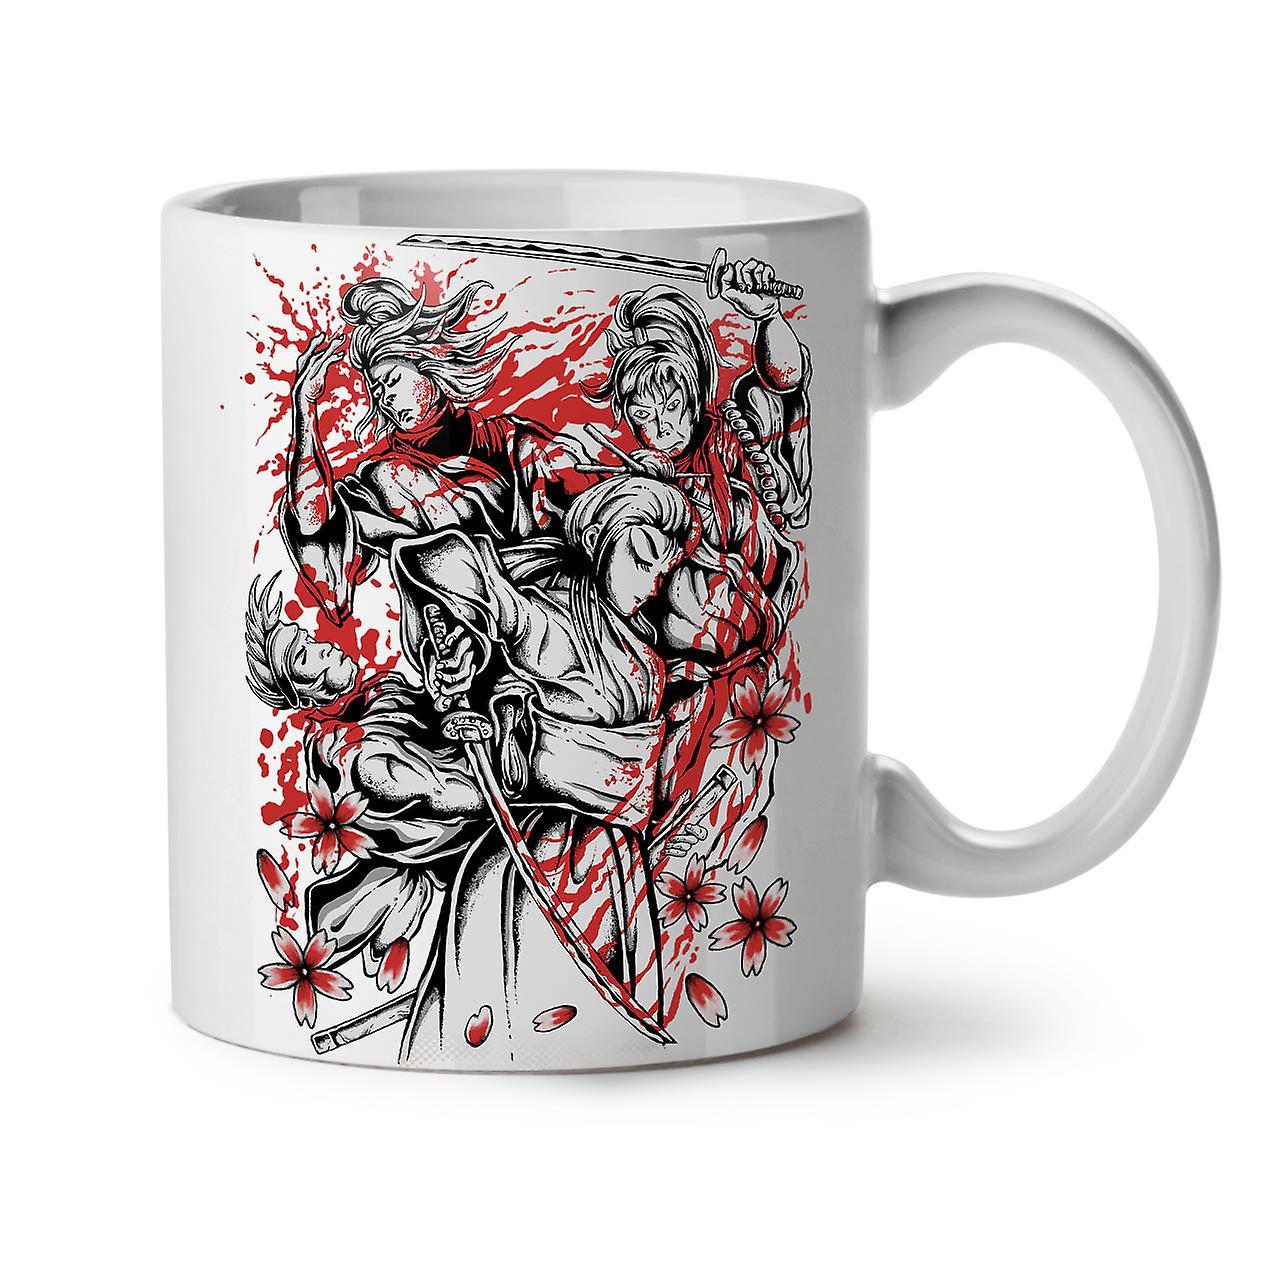 New Hero Mug 11 Warrior OzWellcoda Ceramic Knight Coffee White Tea PXZTiuOk